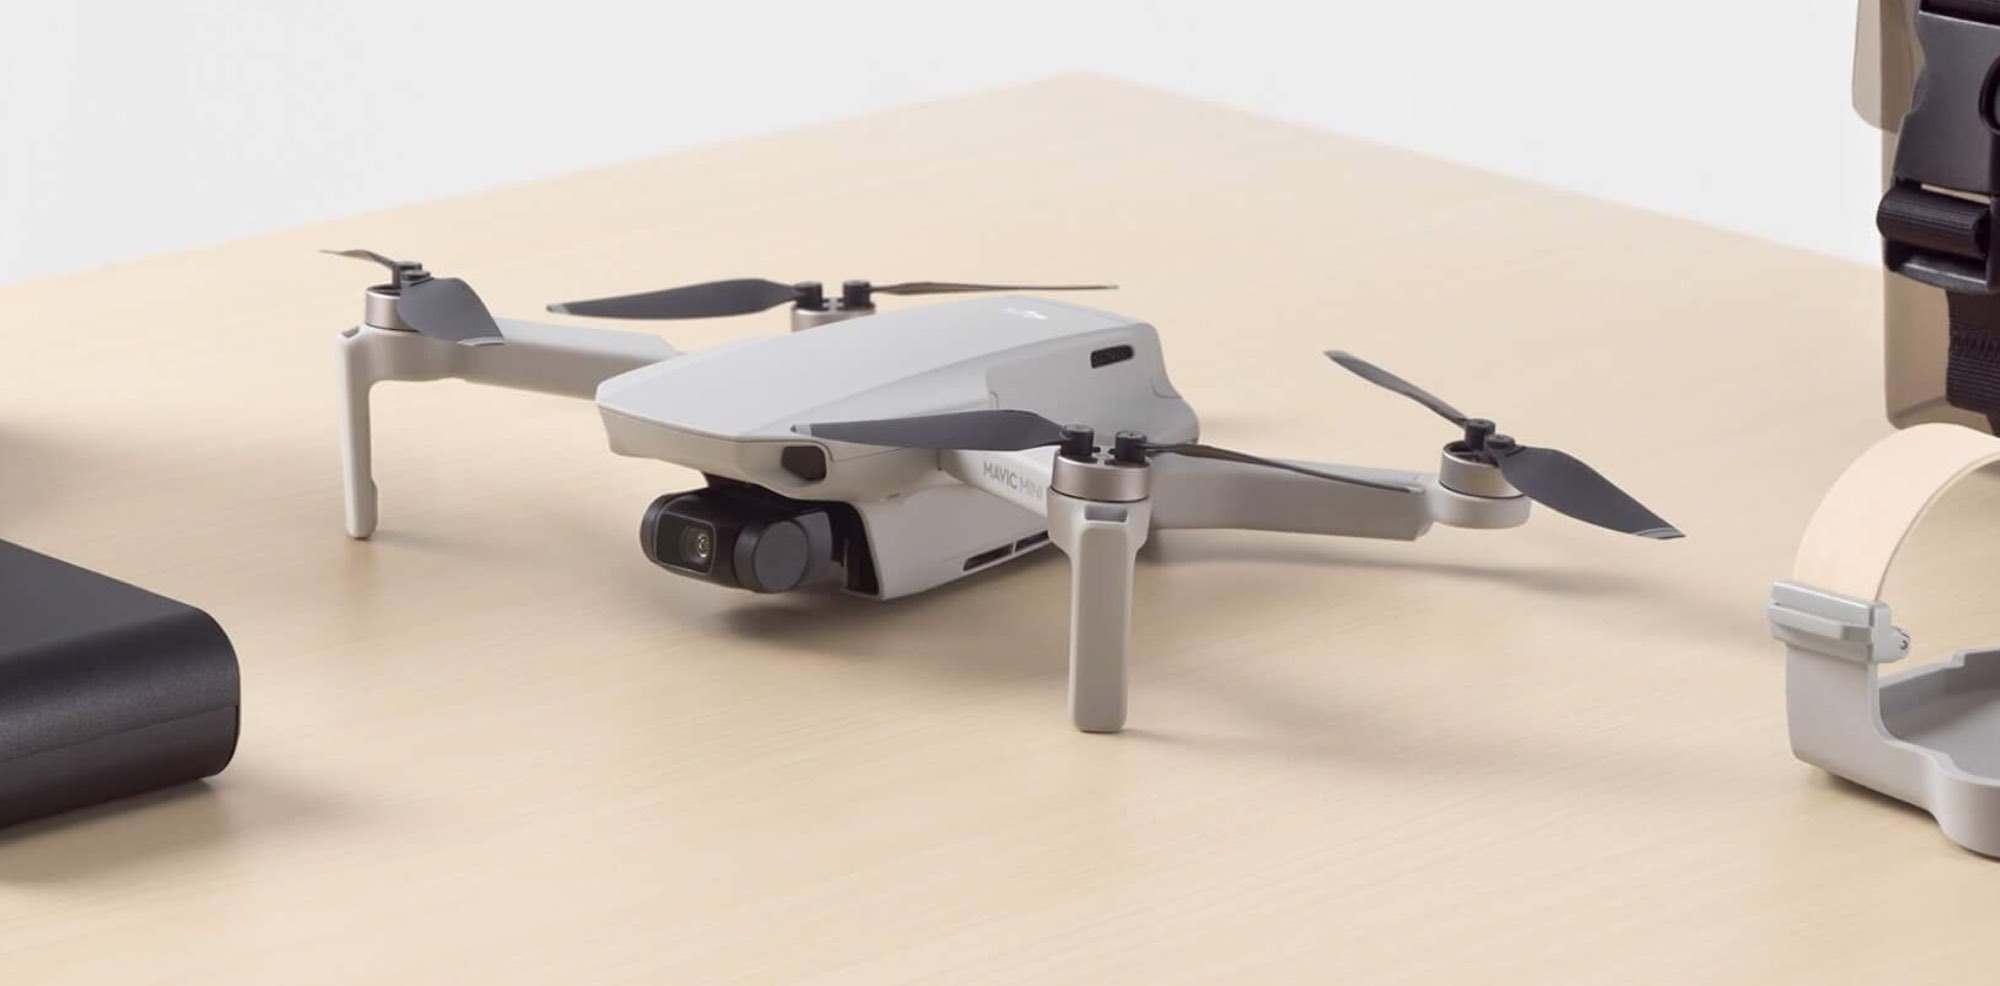 DJI Mavic Mini: Die leichteste Kamera-Drohne offiziell vorgestellt